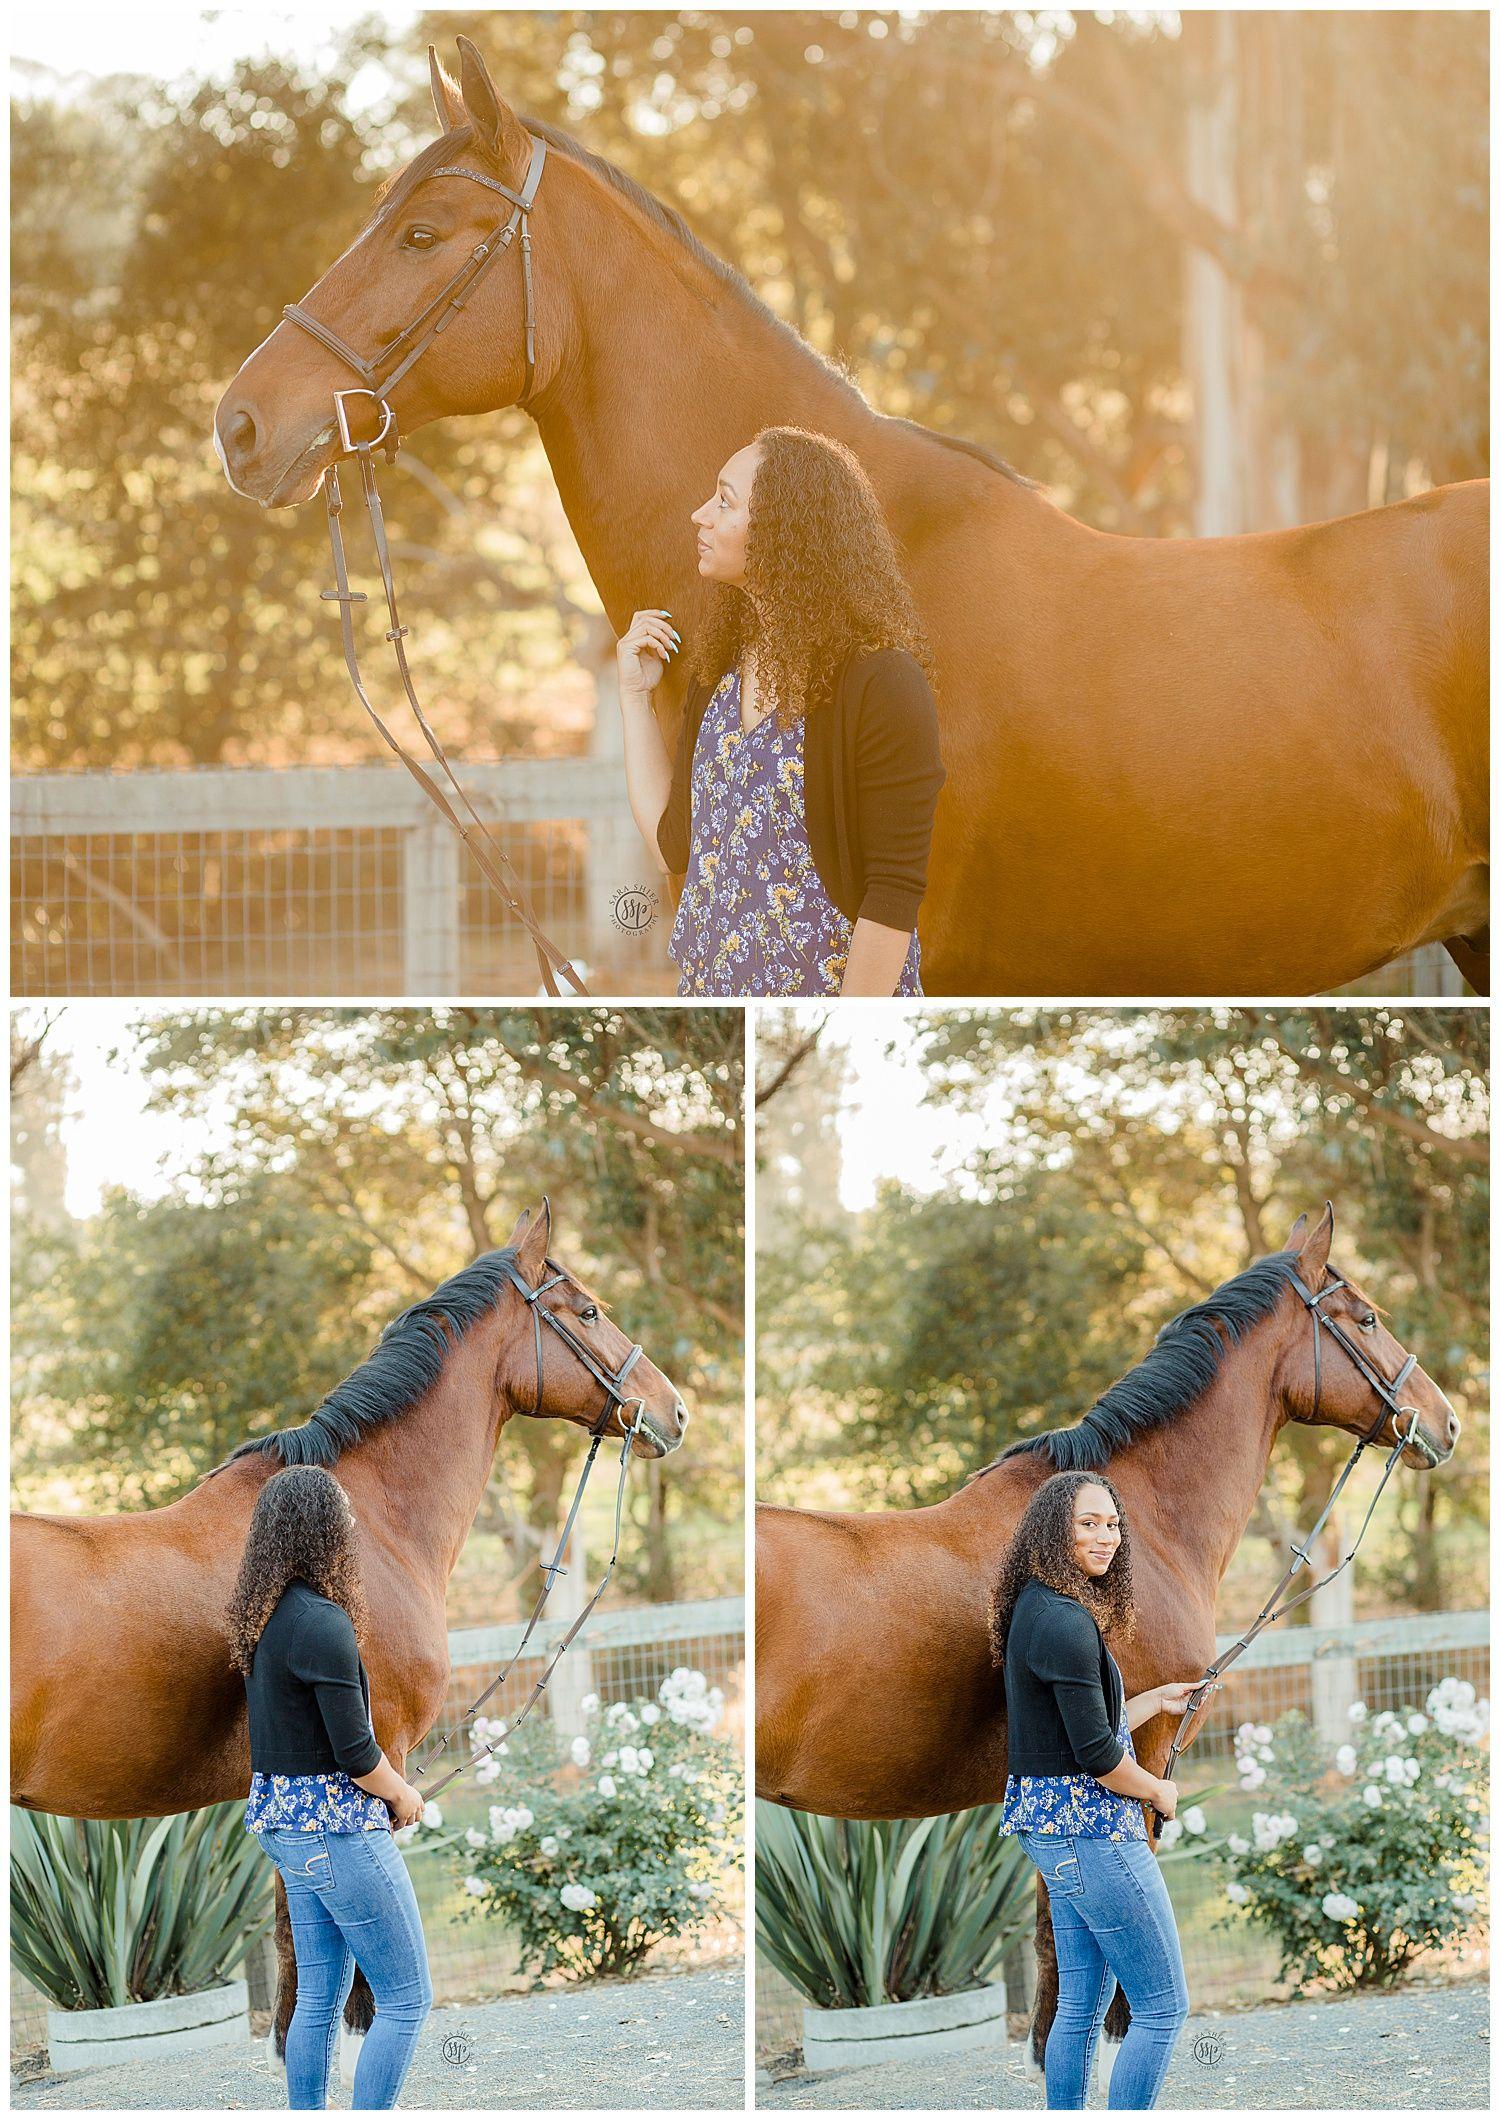 Black Background Horse Rider Equine Photographer Southern California Sara Shier Photography Socal Eques Horse Photoshoot Ideas Equine Photographer Horse Photos